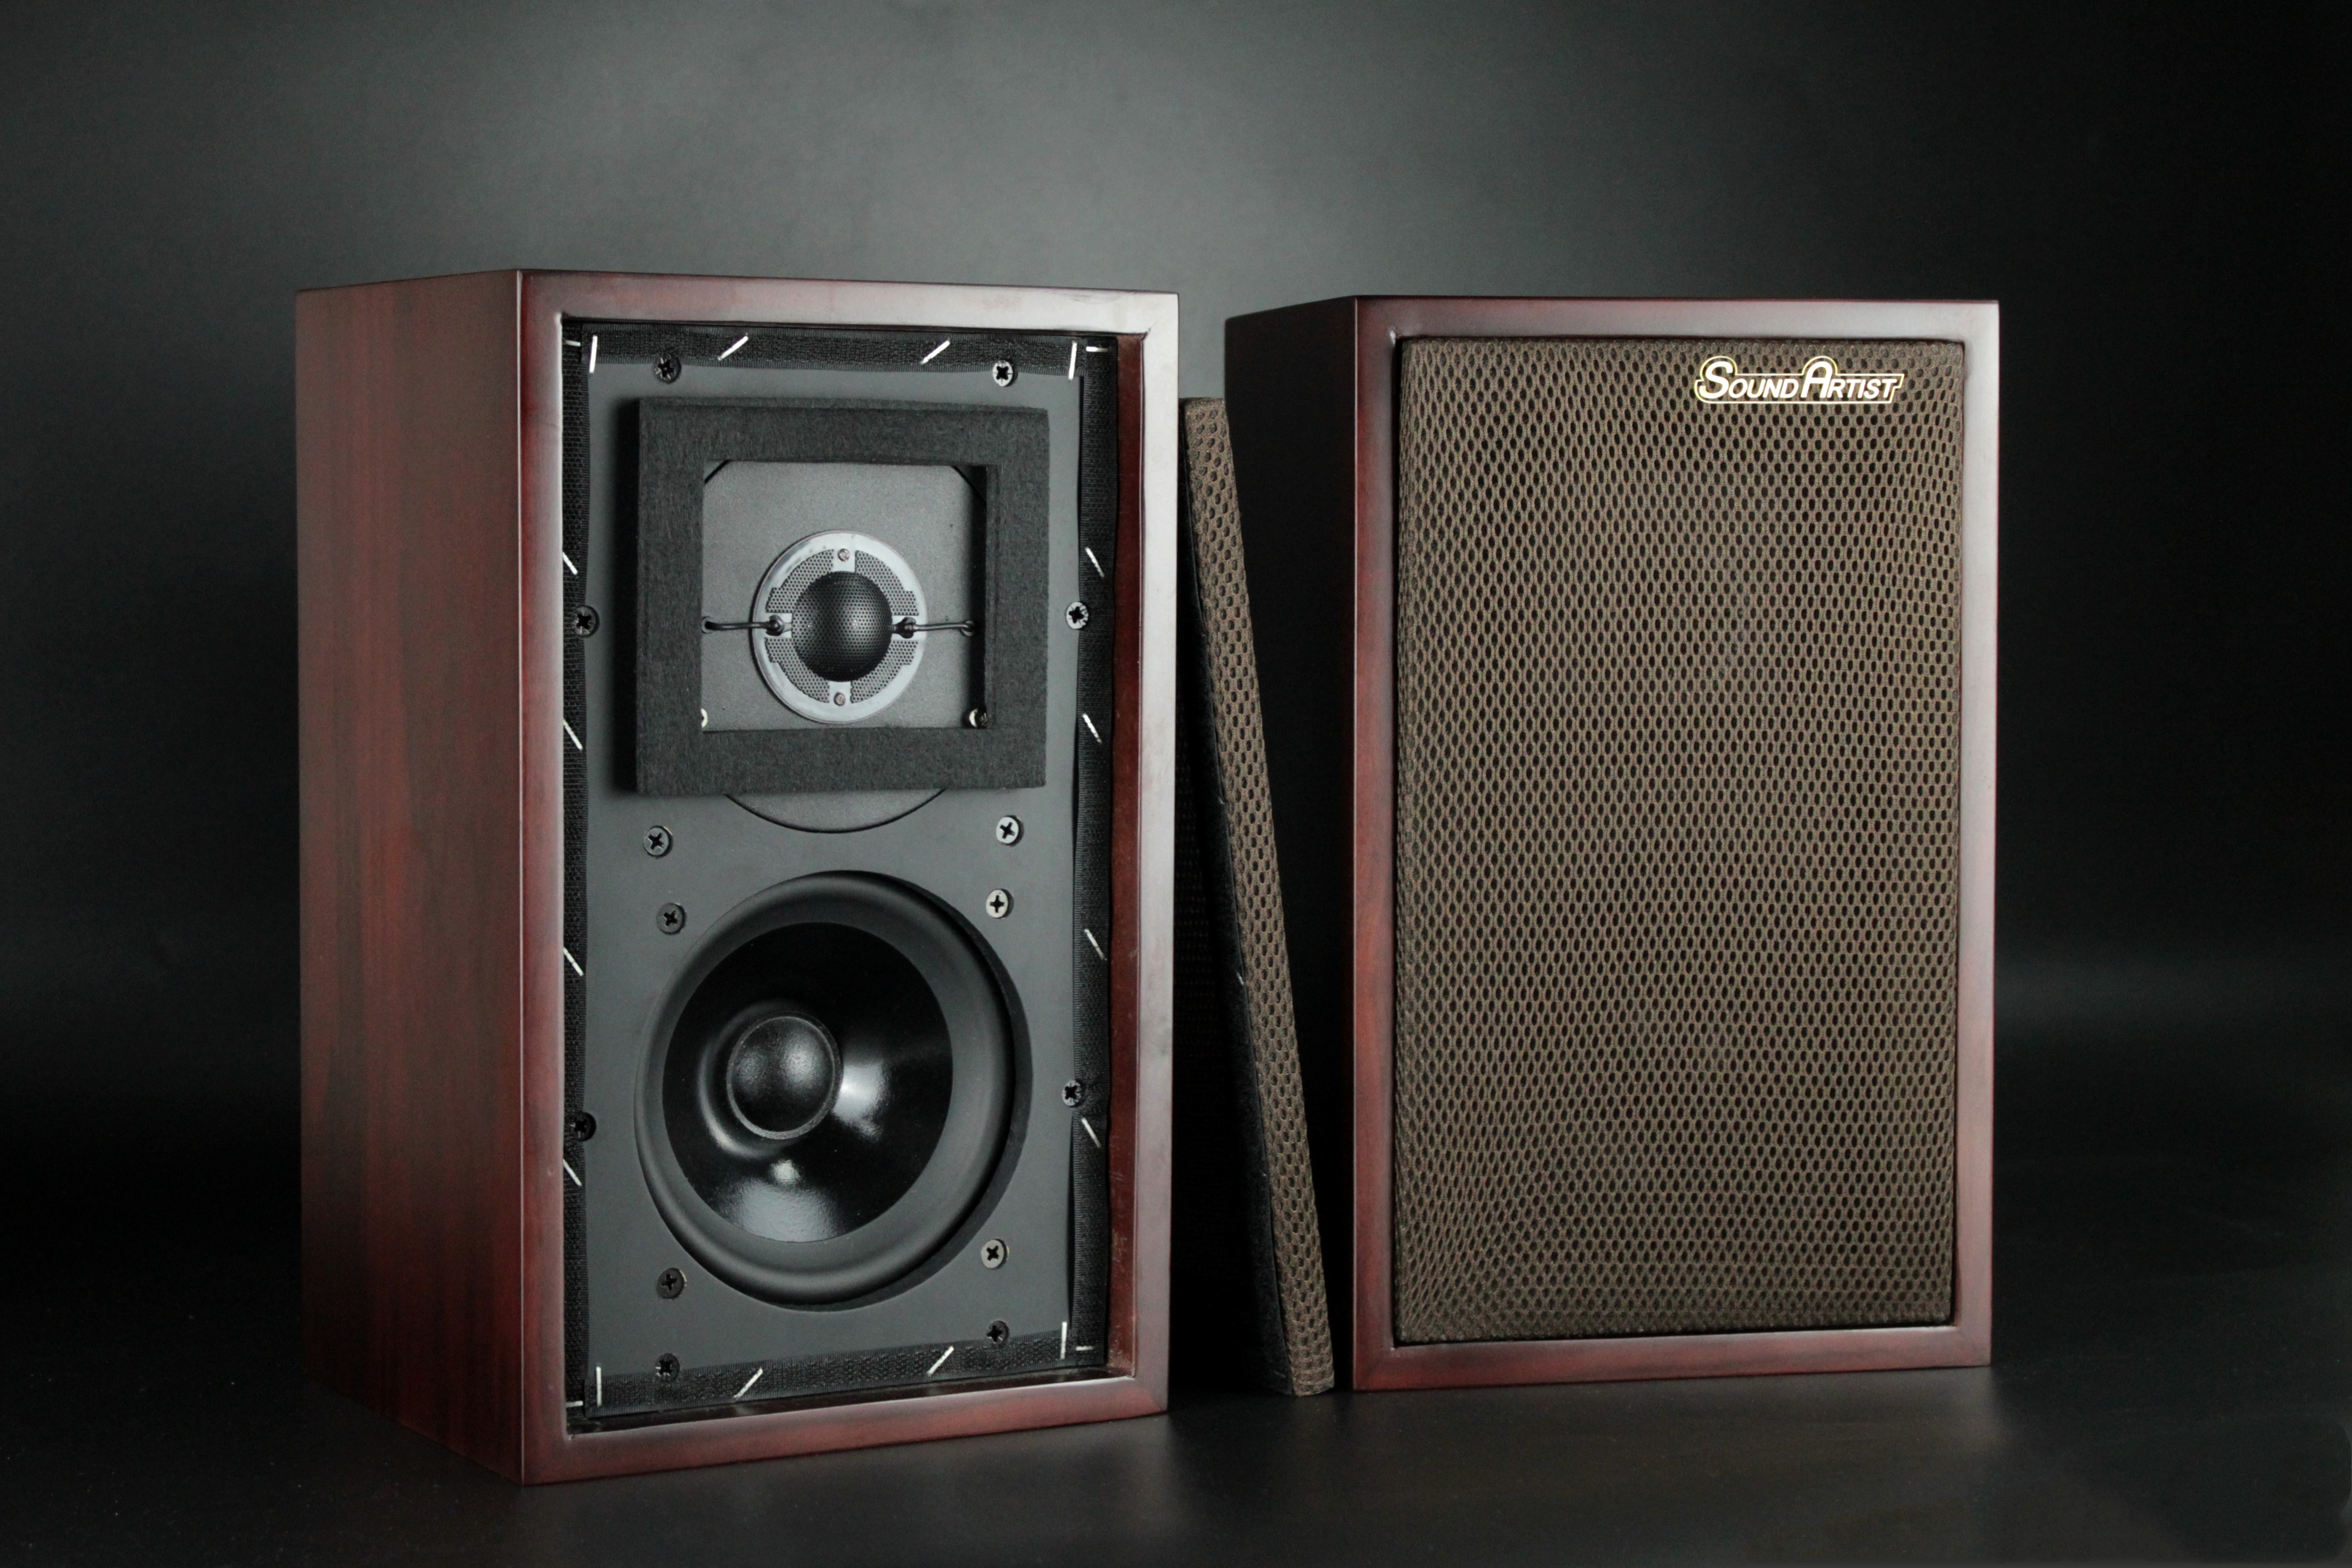 SoundArtist LS3/5A Monitor Bookshelf HIFI Speakers Passive Loudspeakers A Pair Sent From Europe